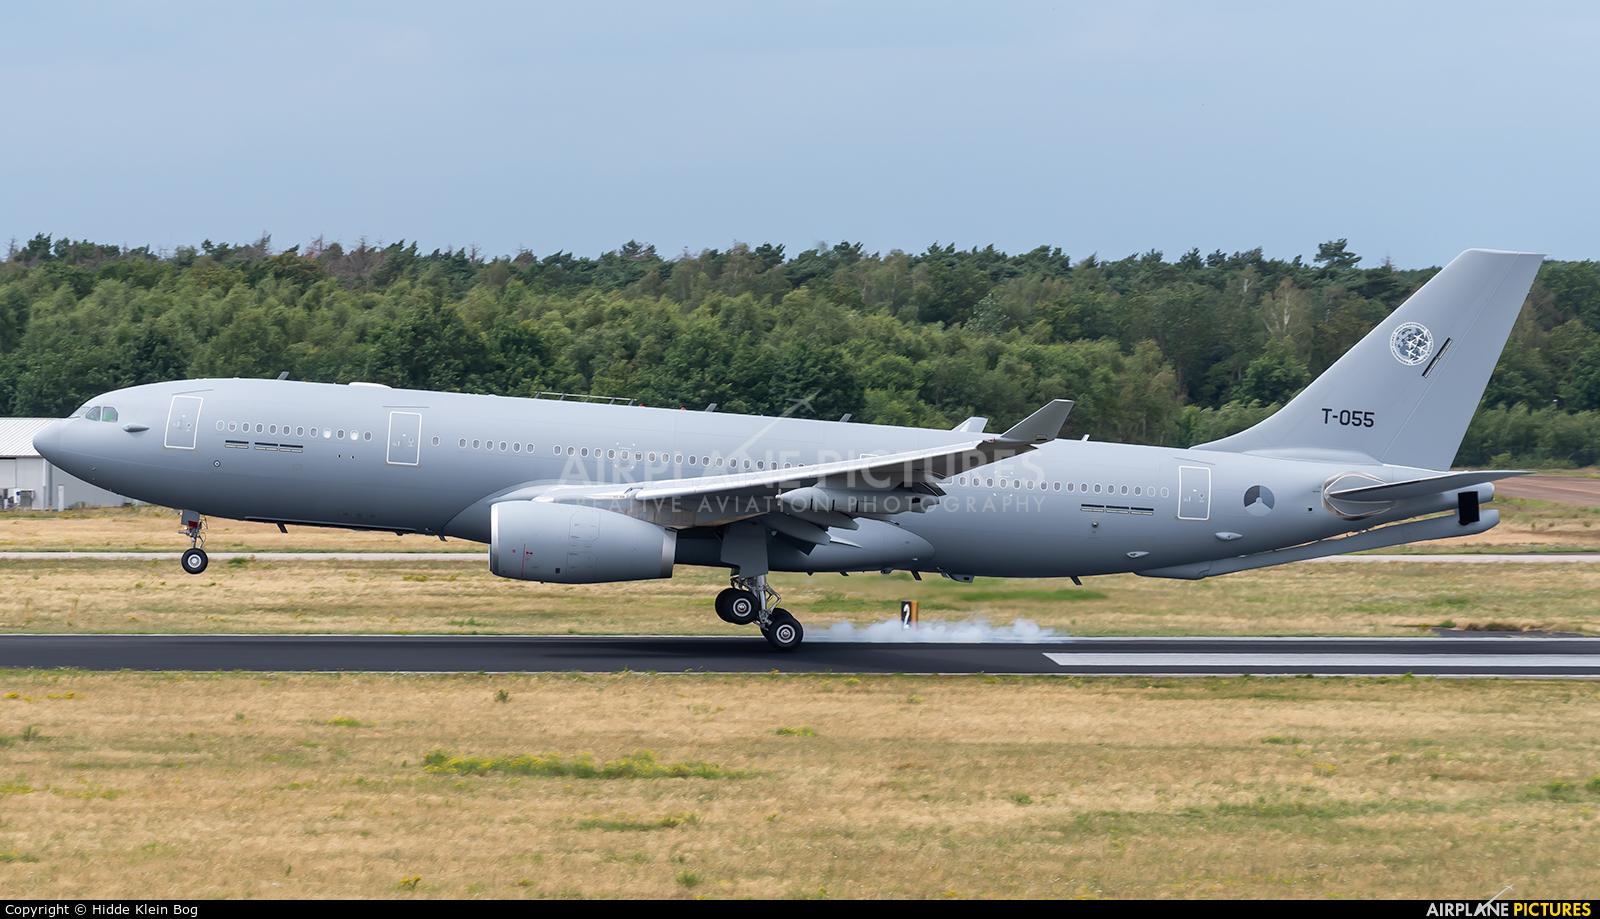 NATO T-055 aircraft at Eindhoven